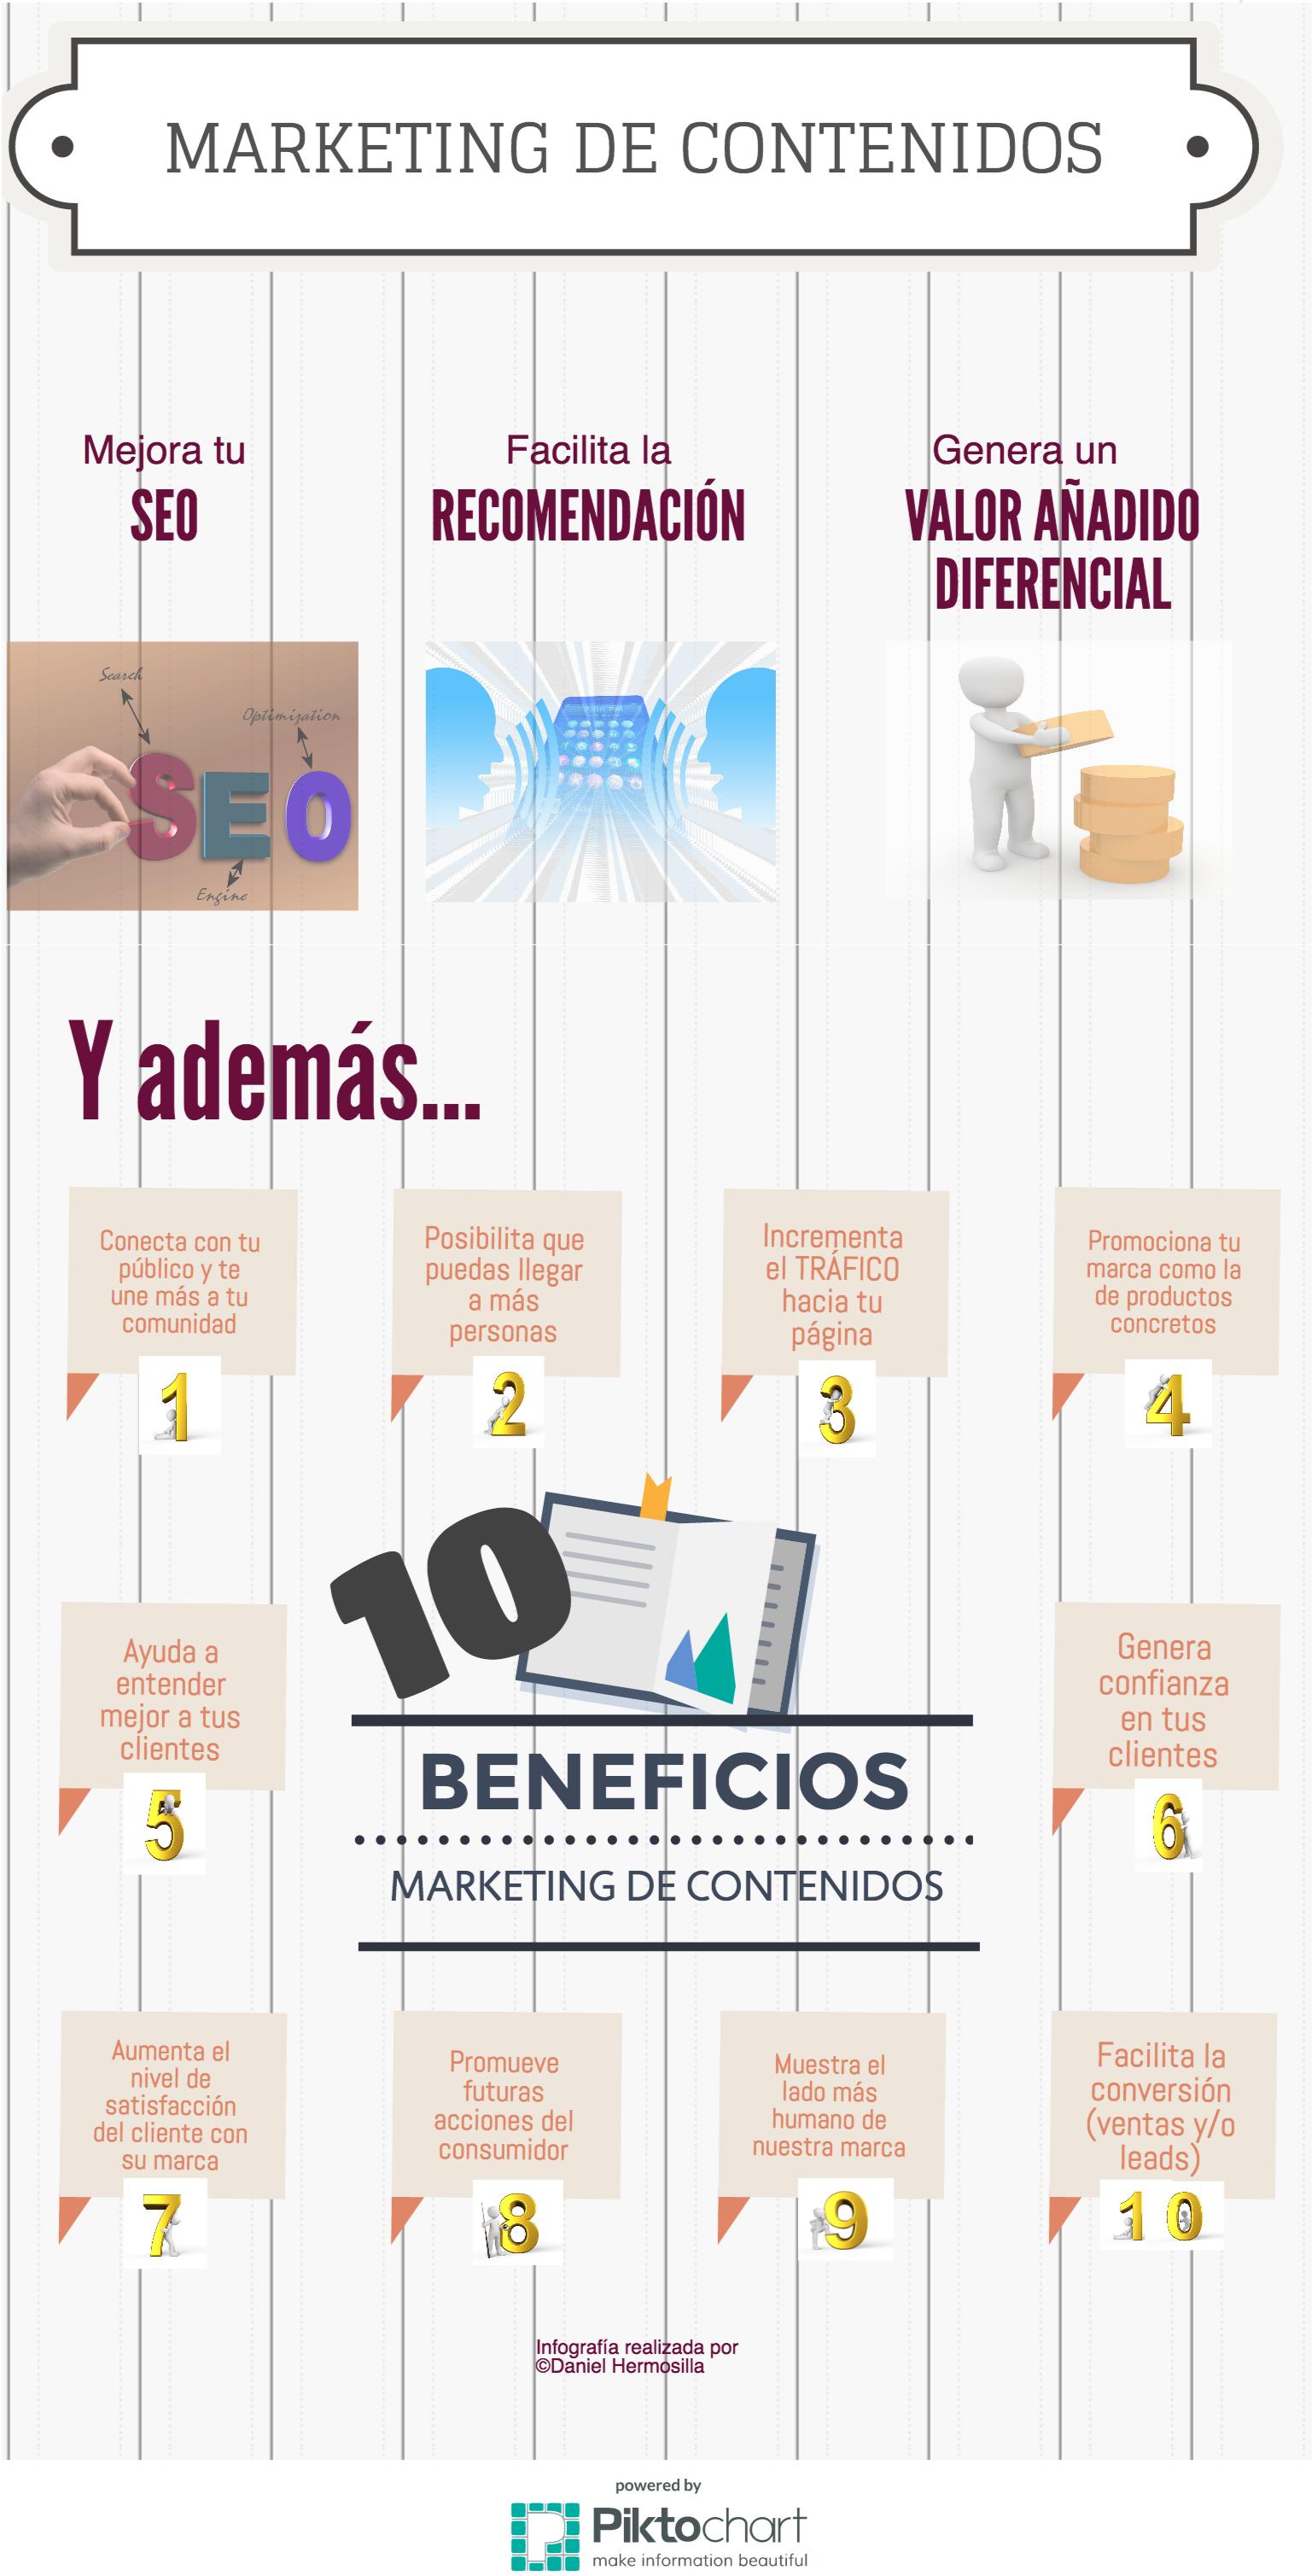 10 beneficios del Marketing de Contenidos #infografia #infographic #marketing